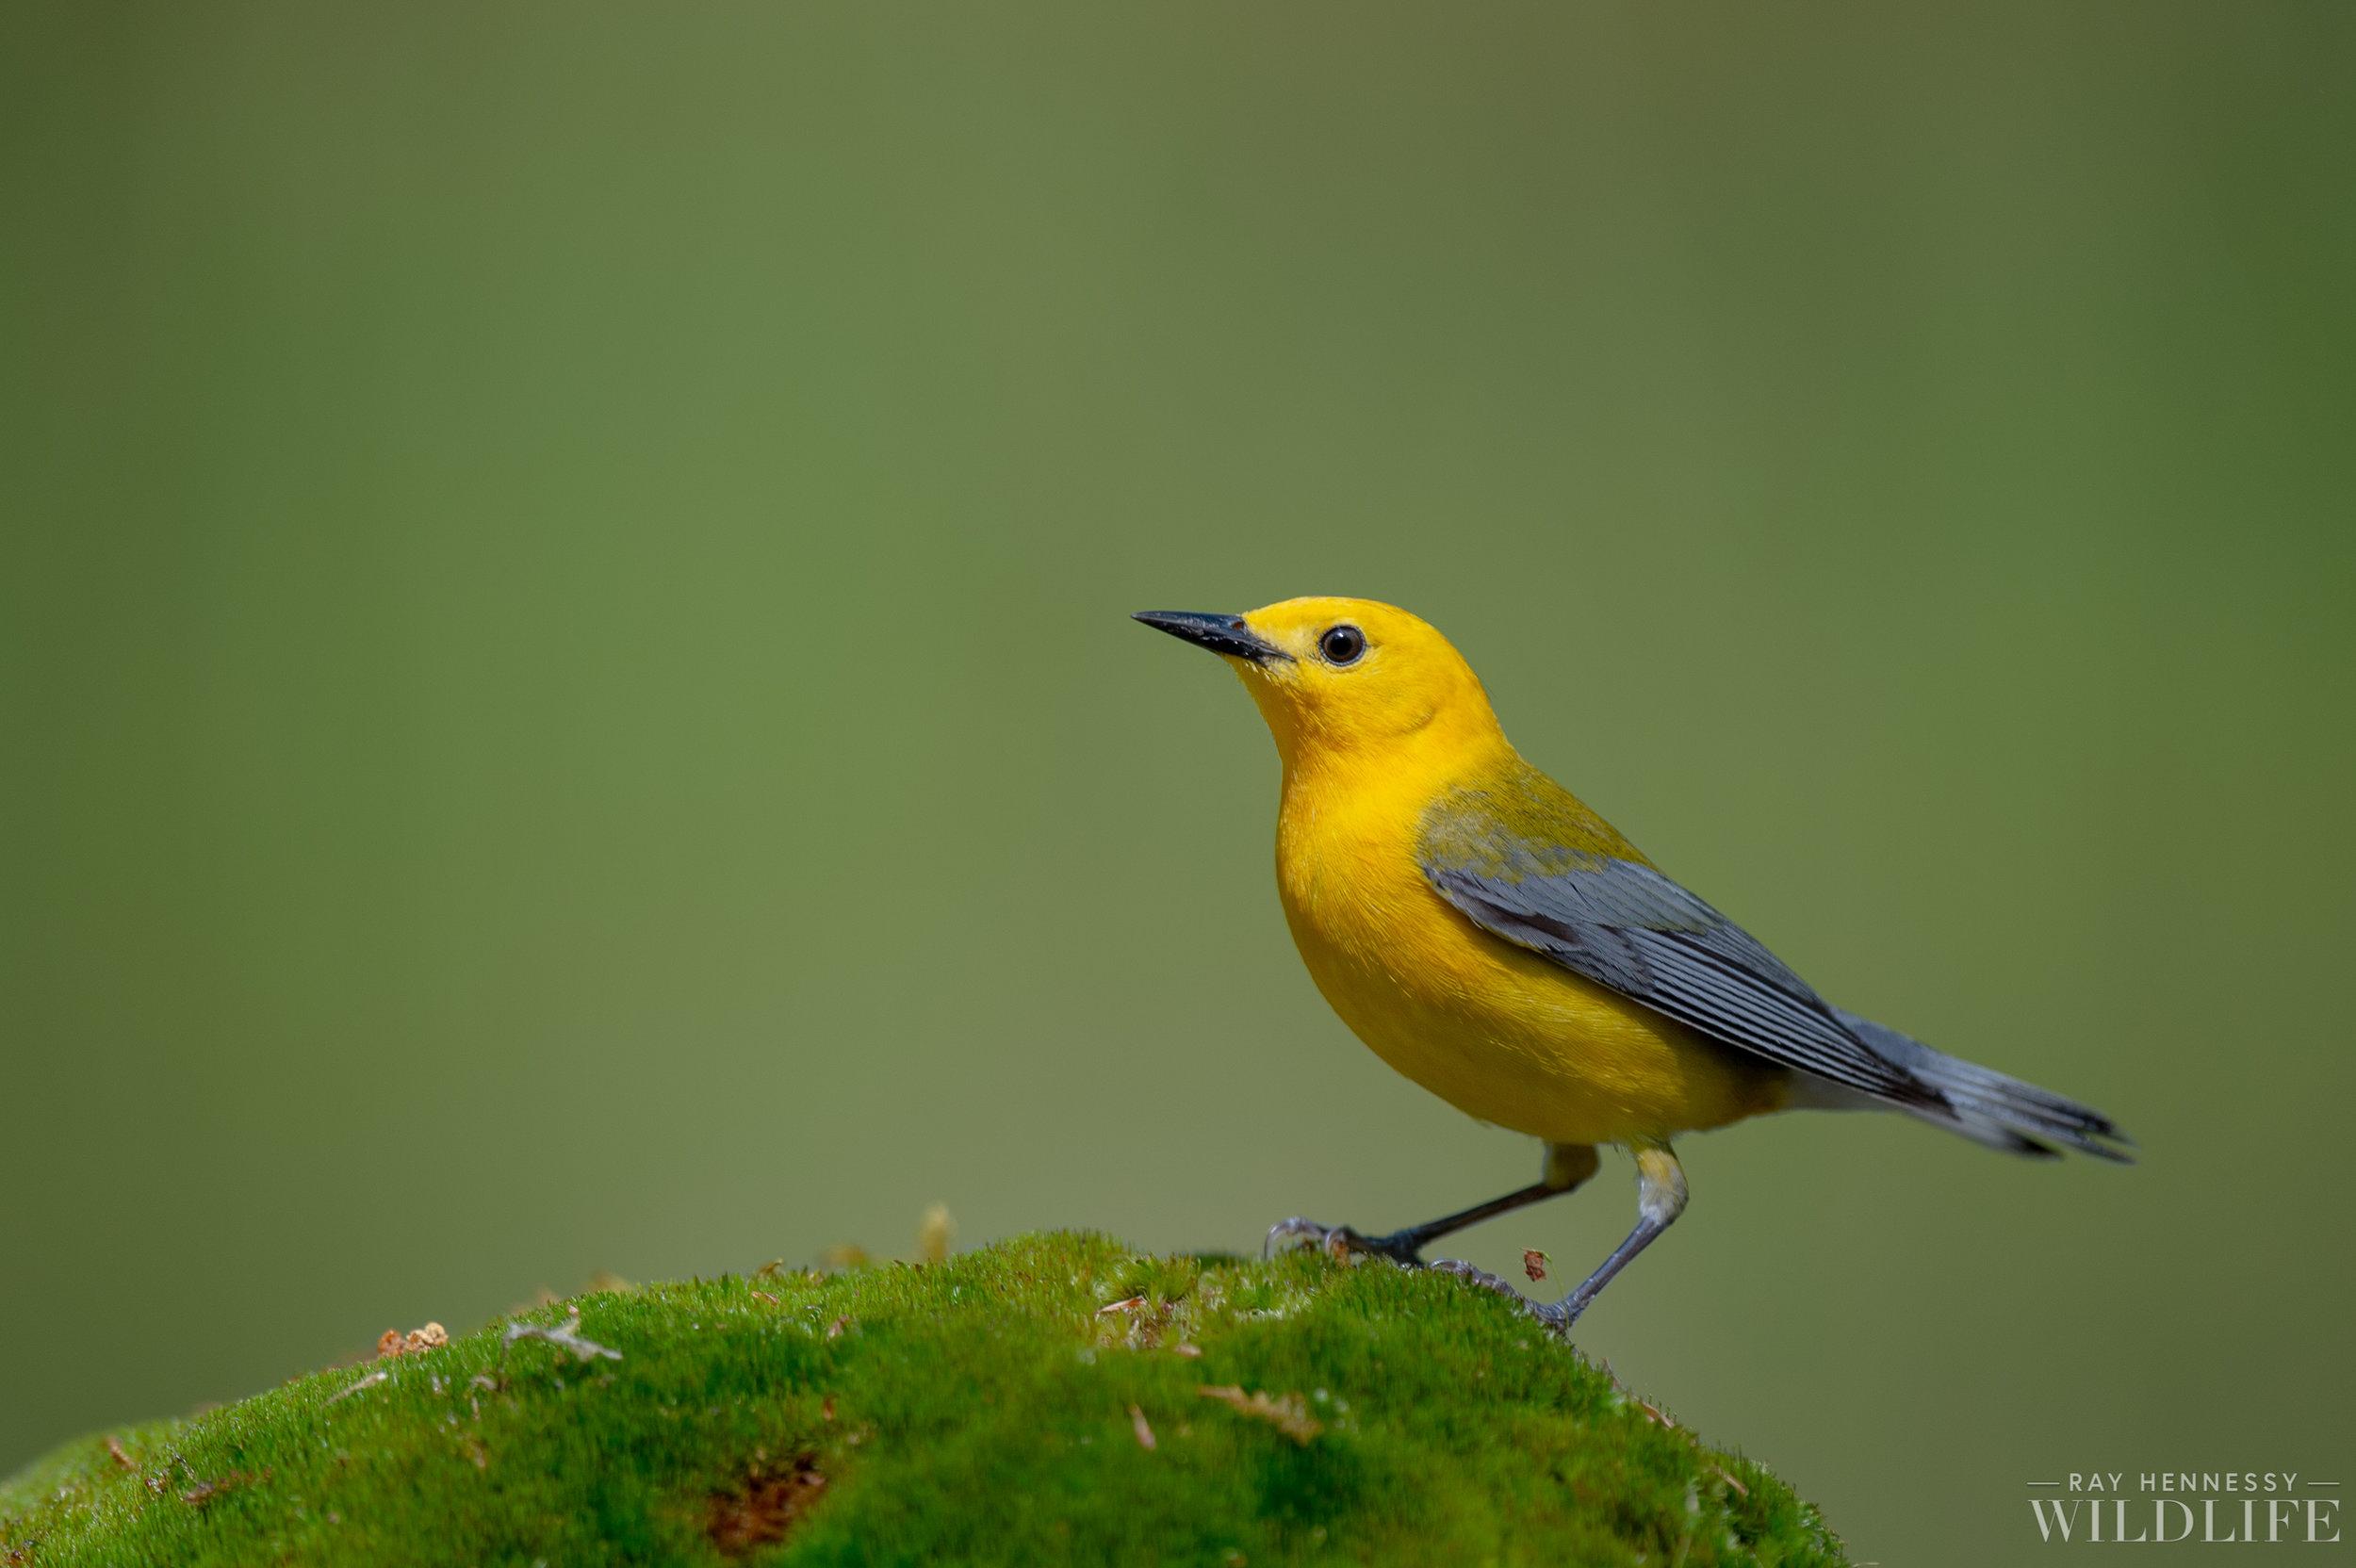 009_Prothonotary Warbler.jpg